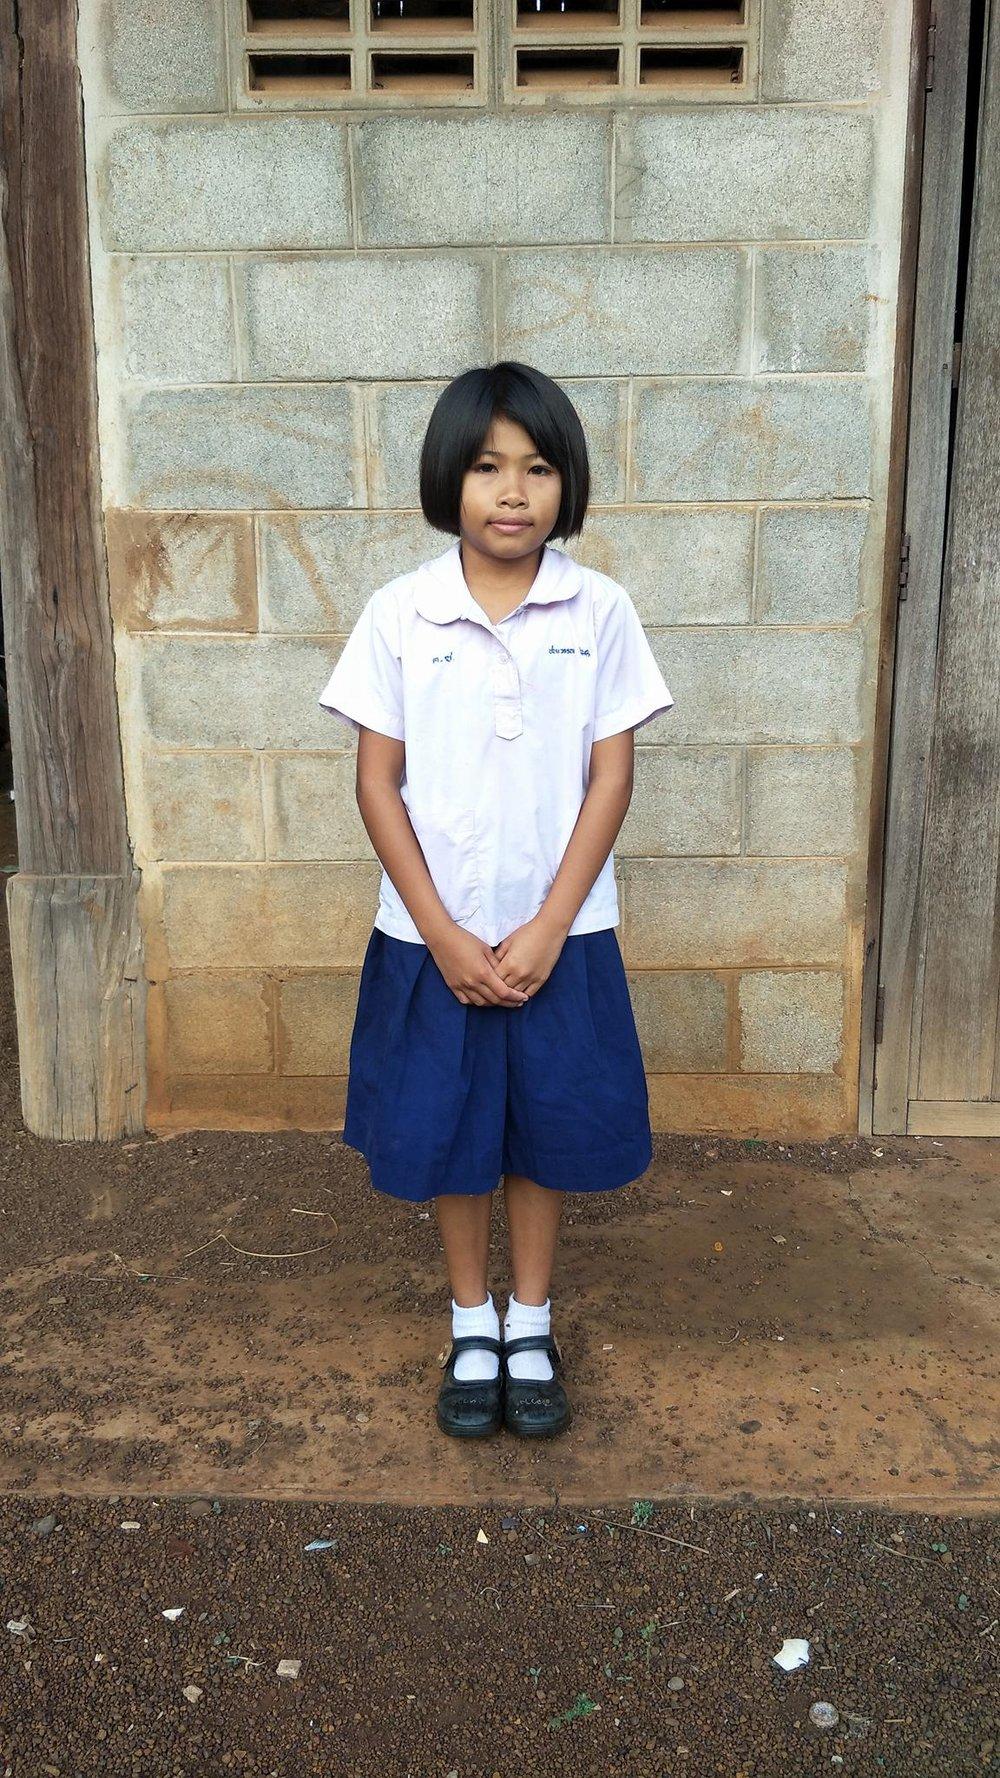 Chanawan (8 years old, Girl)